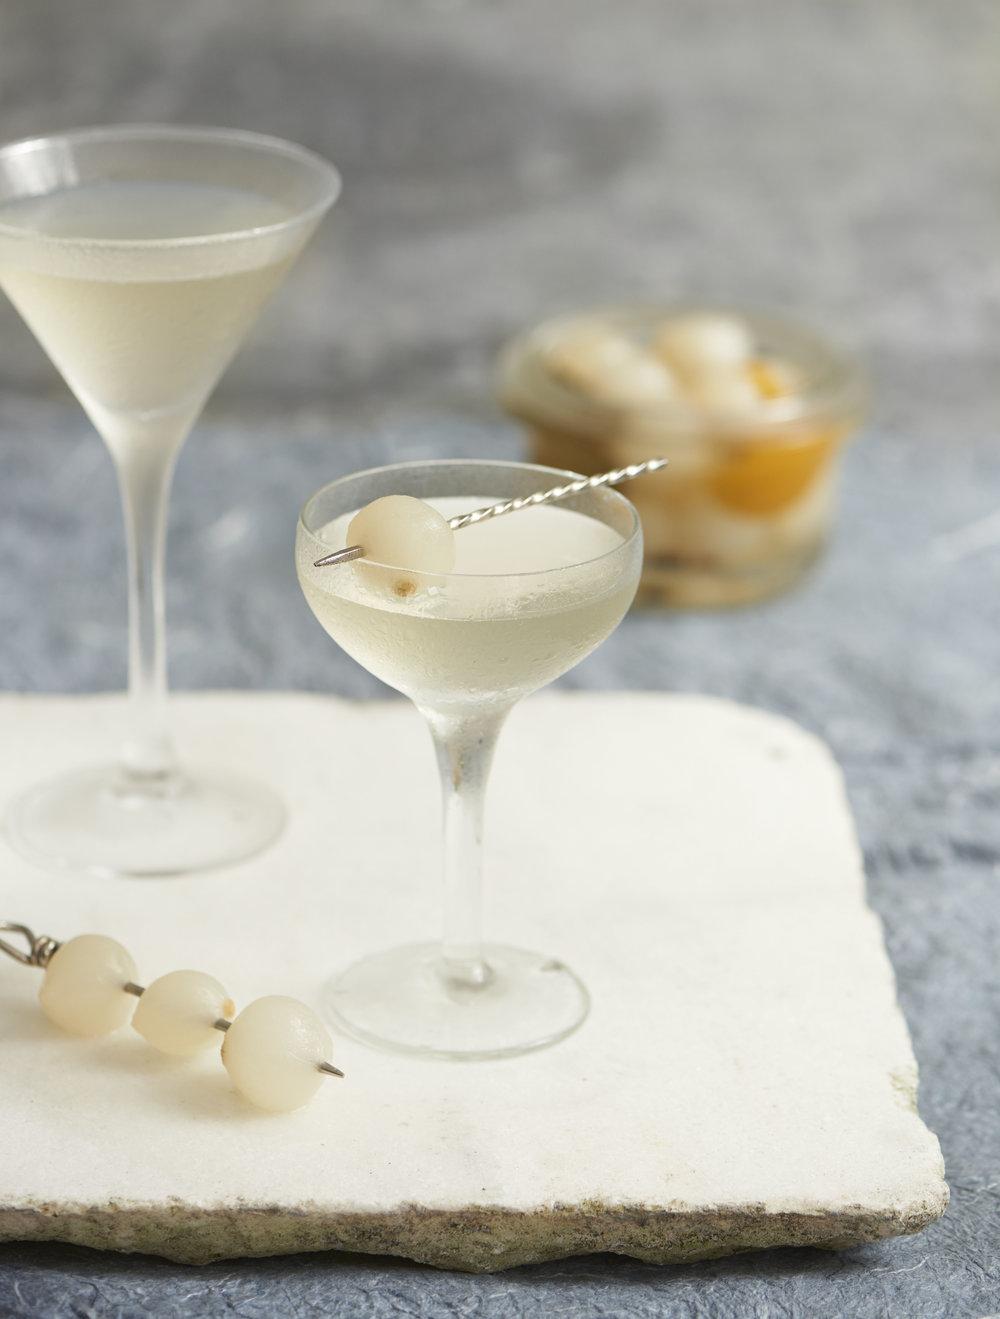 Pearl Onion Martini Polly.jpg